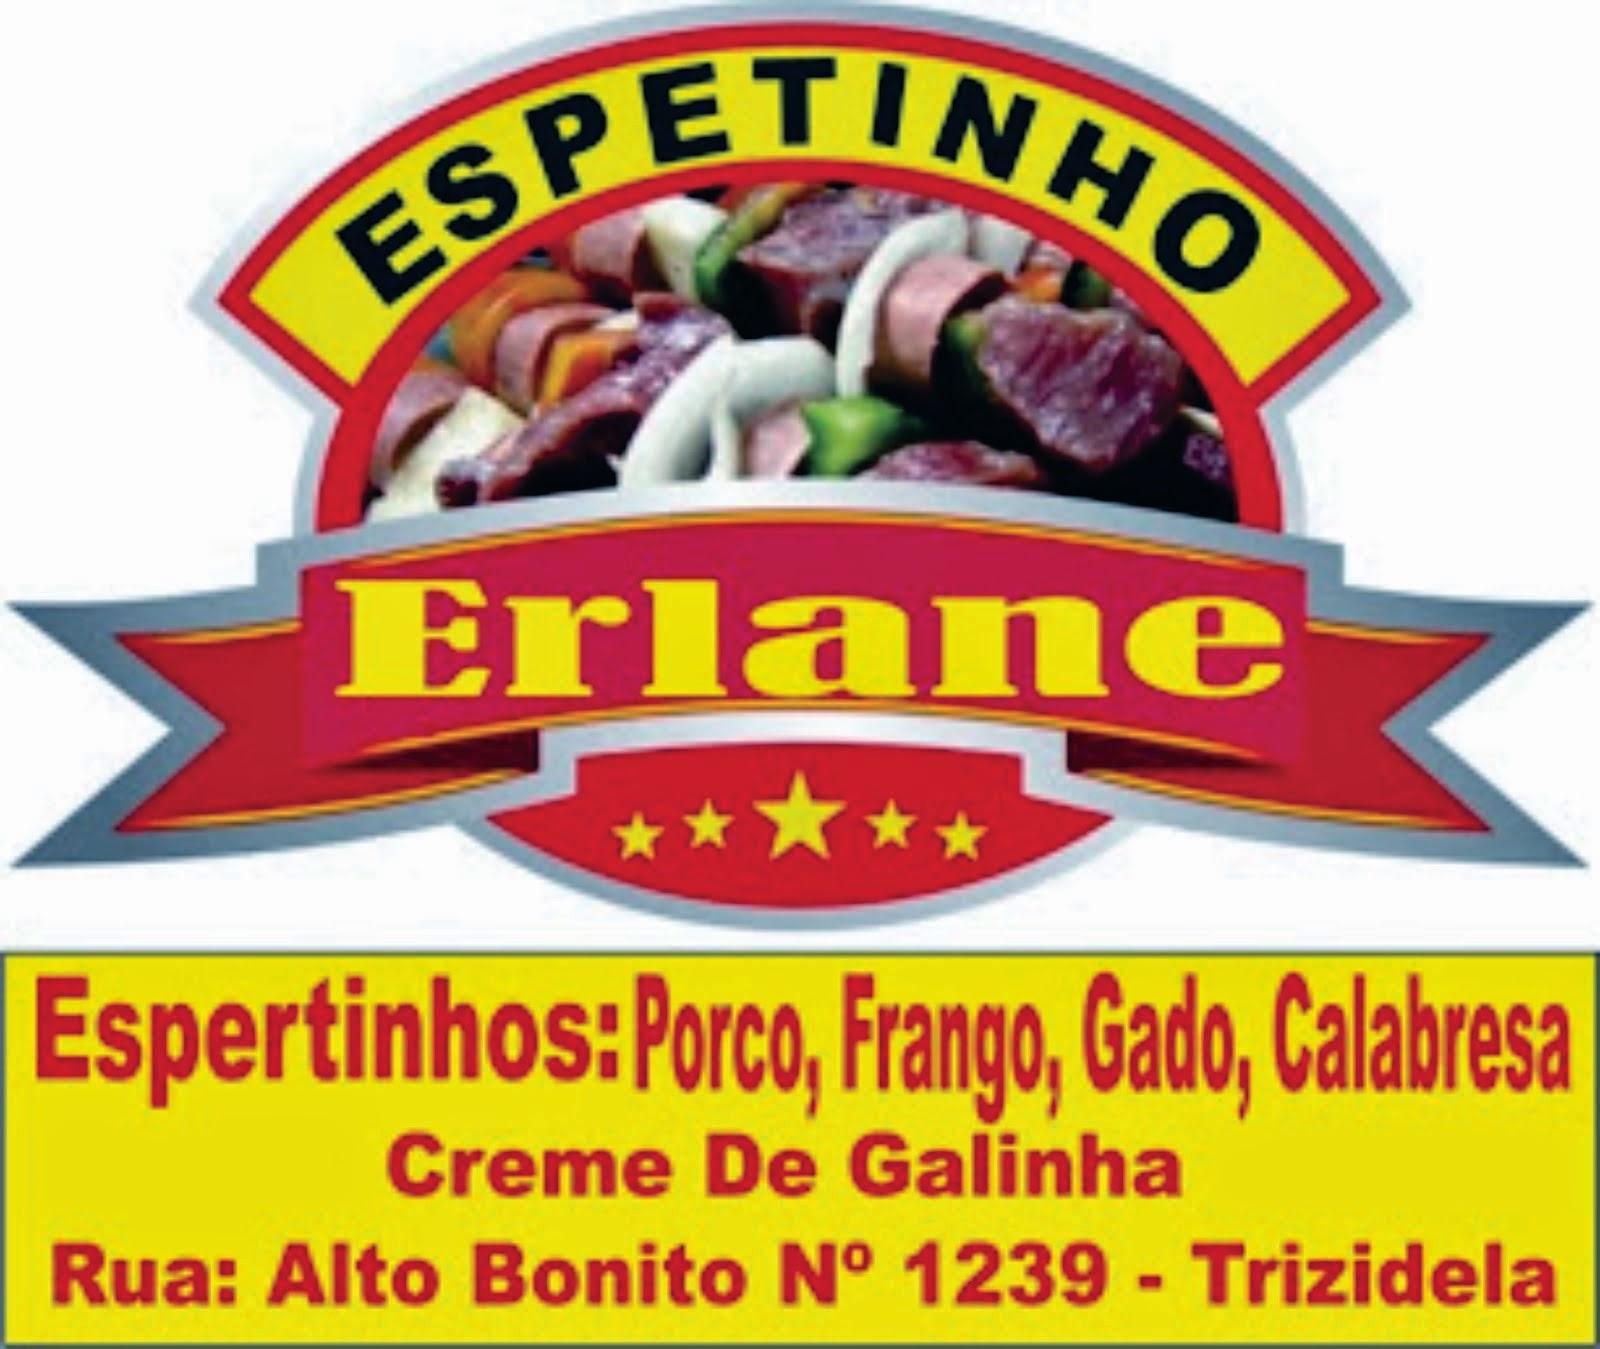 ESPETINHO ERLANE